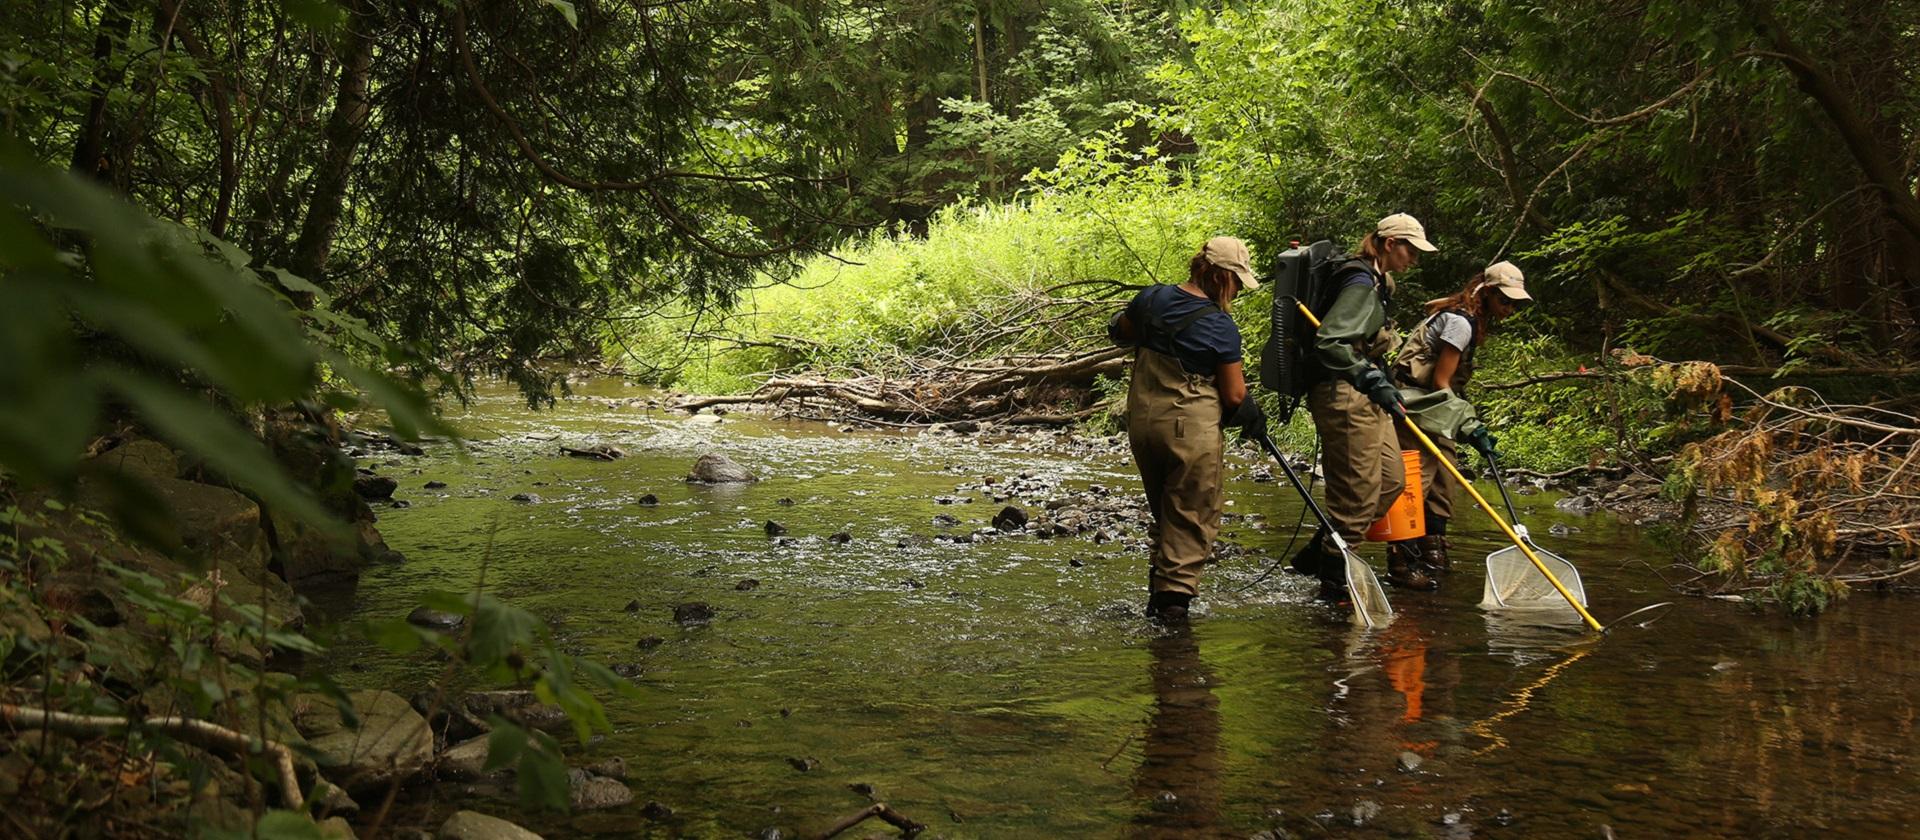 TRCA environmental monitoring staff electrofishing in a stream